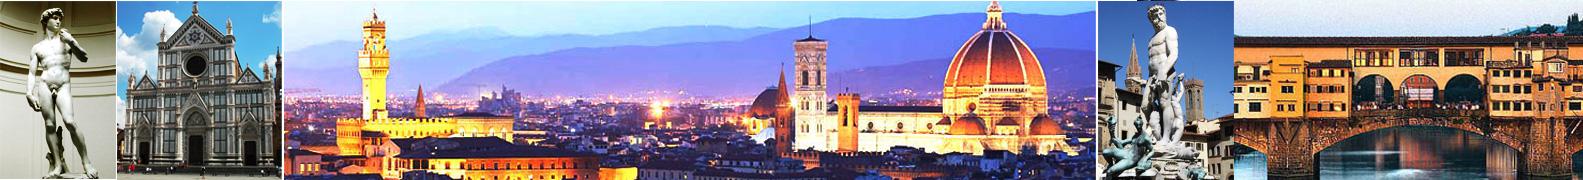 Confedilizi Panorama Firenze